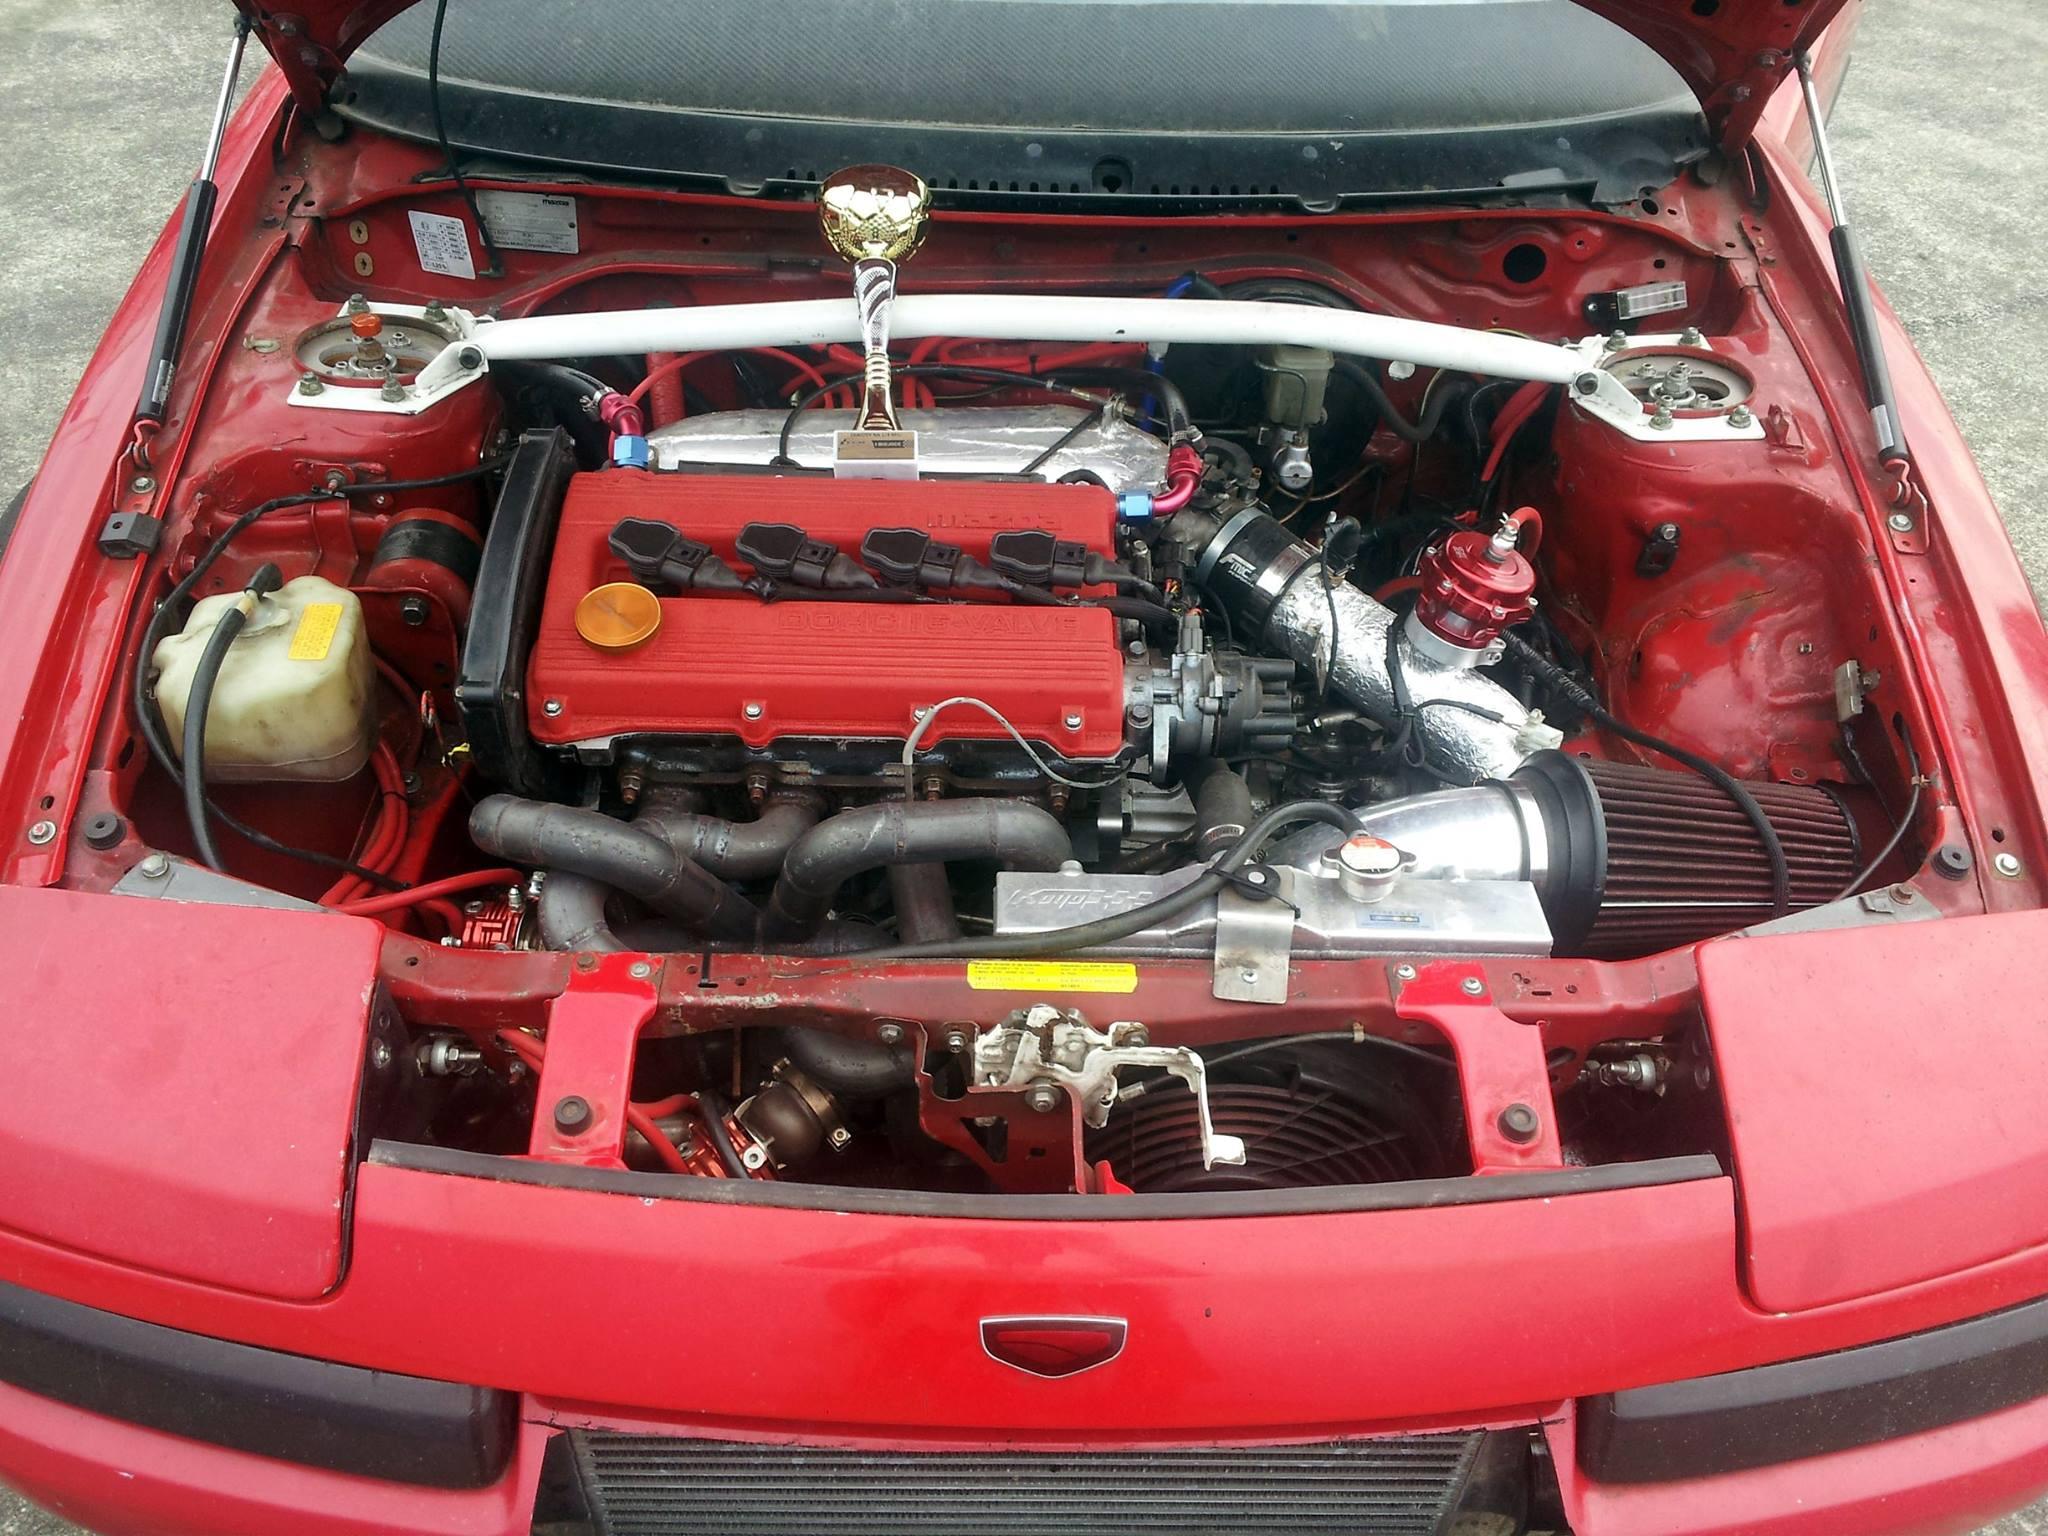 Mazda 323f with a turbo 18 l bp engine swap depot altavistaventures Images